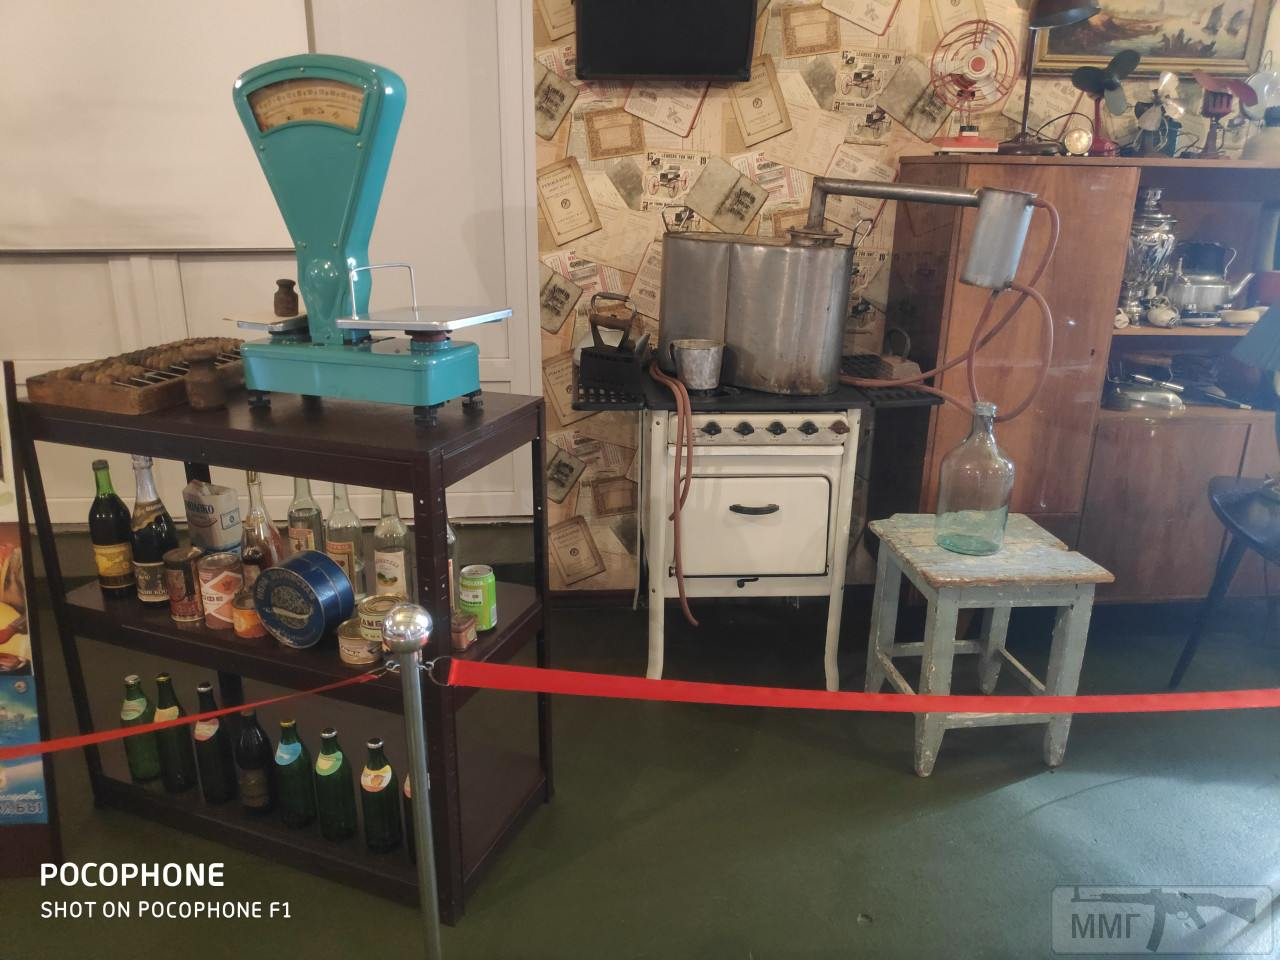 71117 - Музей техники Фаэтон в г. Запорожье